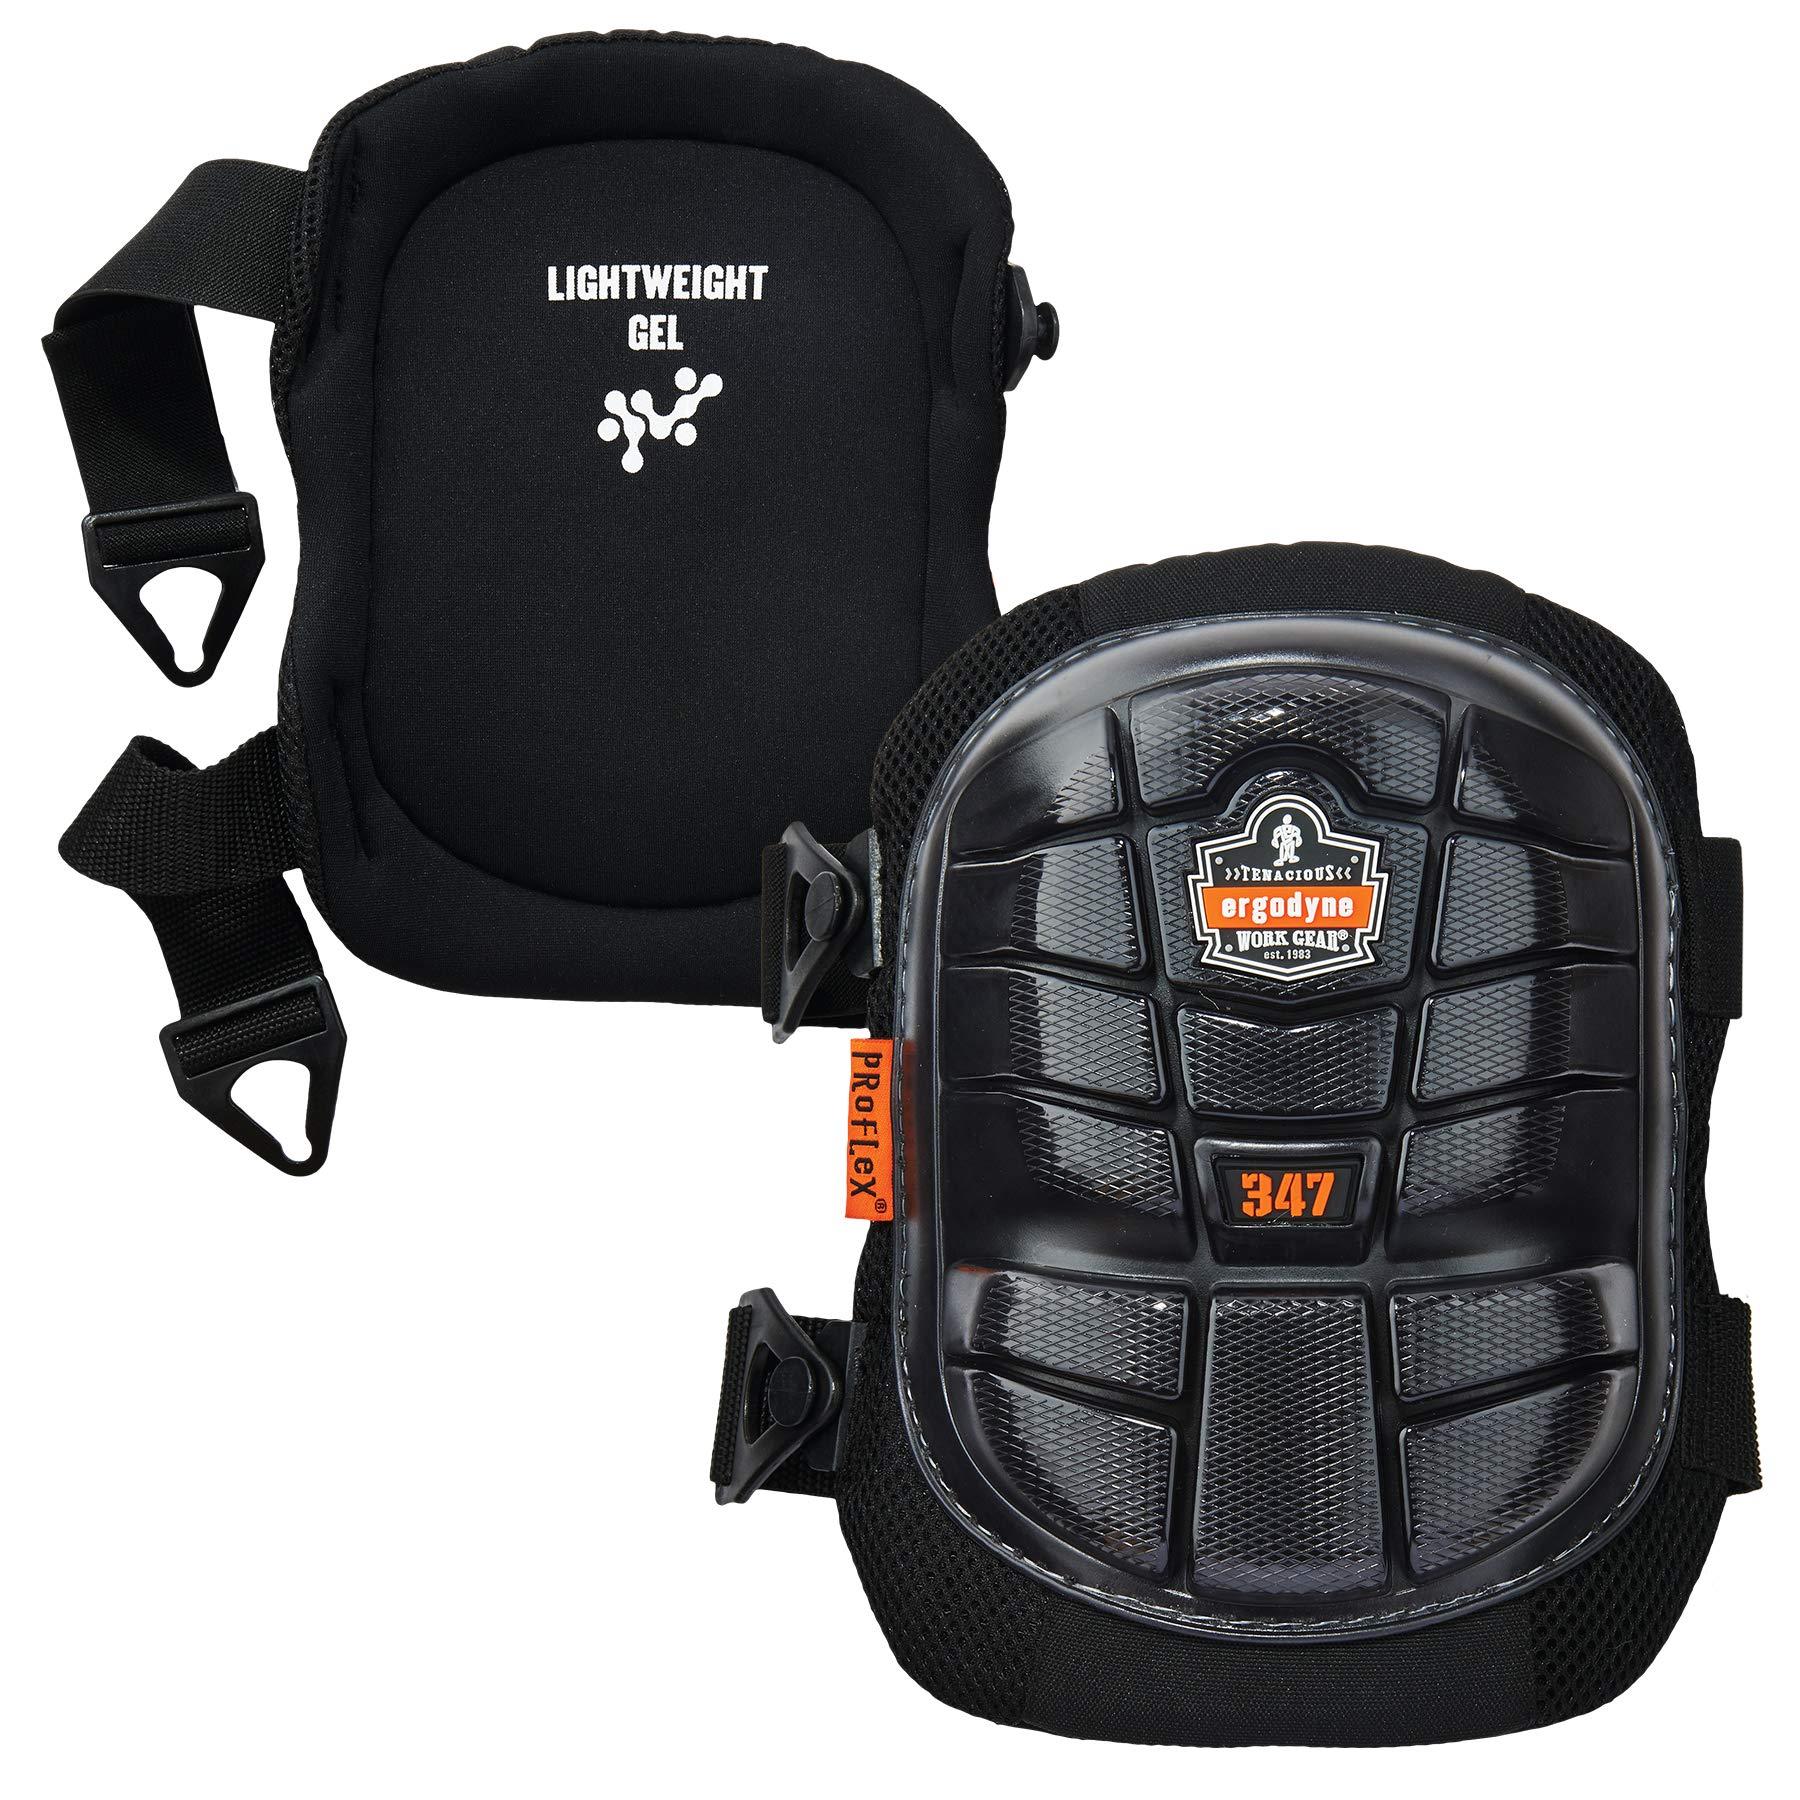 Ergodyne ProFlex 347 Professional Knee Pads,  Protective Long Cap, Lighweight Gel Padded Technology, Adjustable Straps, Black